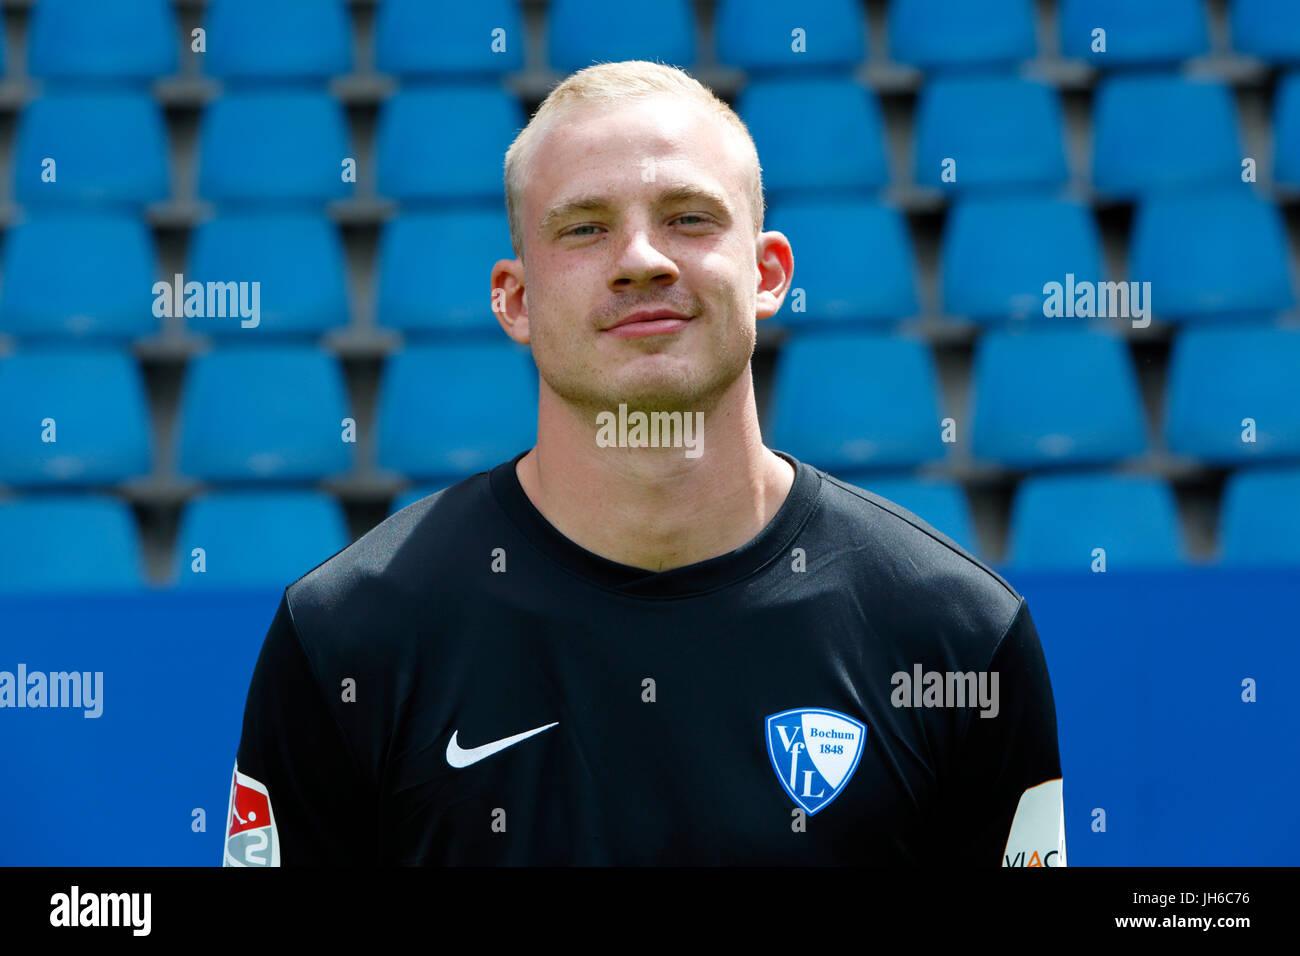 football, 2. Bundesliga, 2017/2018, VfL Bochum, team presentation for the game season, keeper Felix Dornebusch Stock Photo